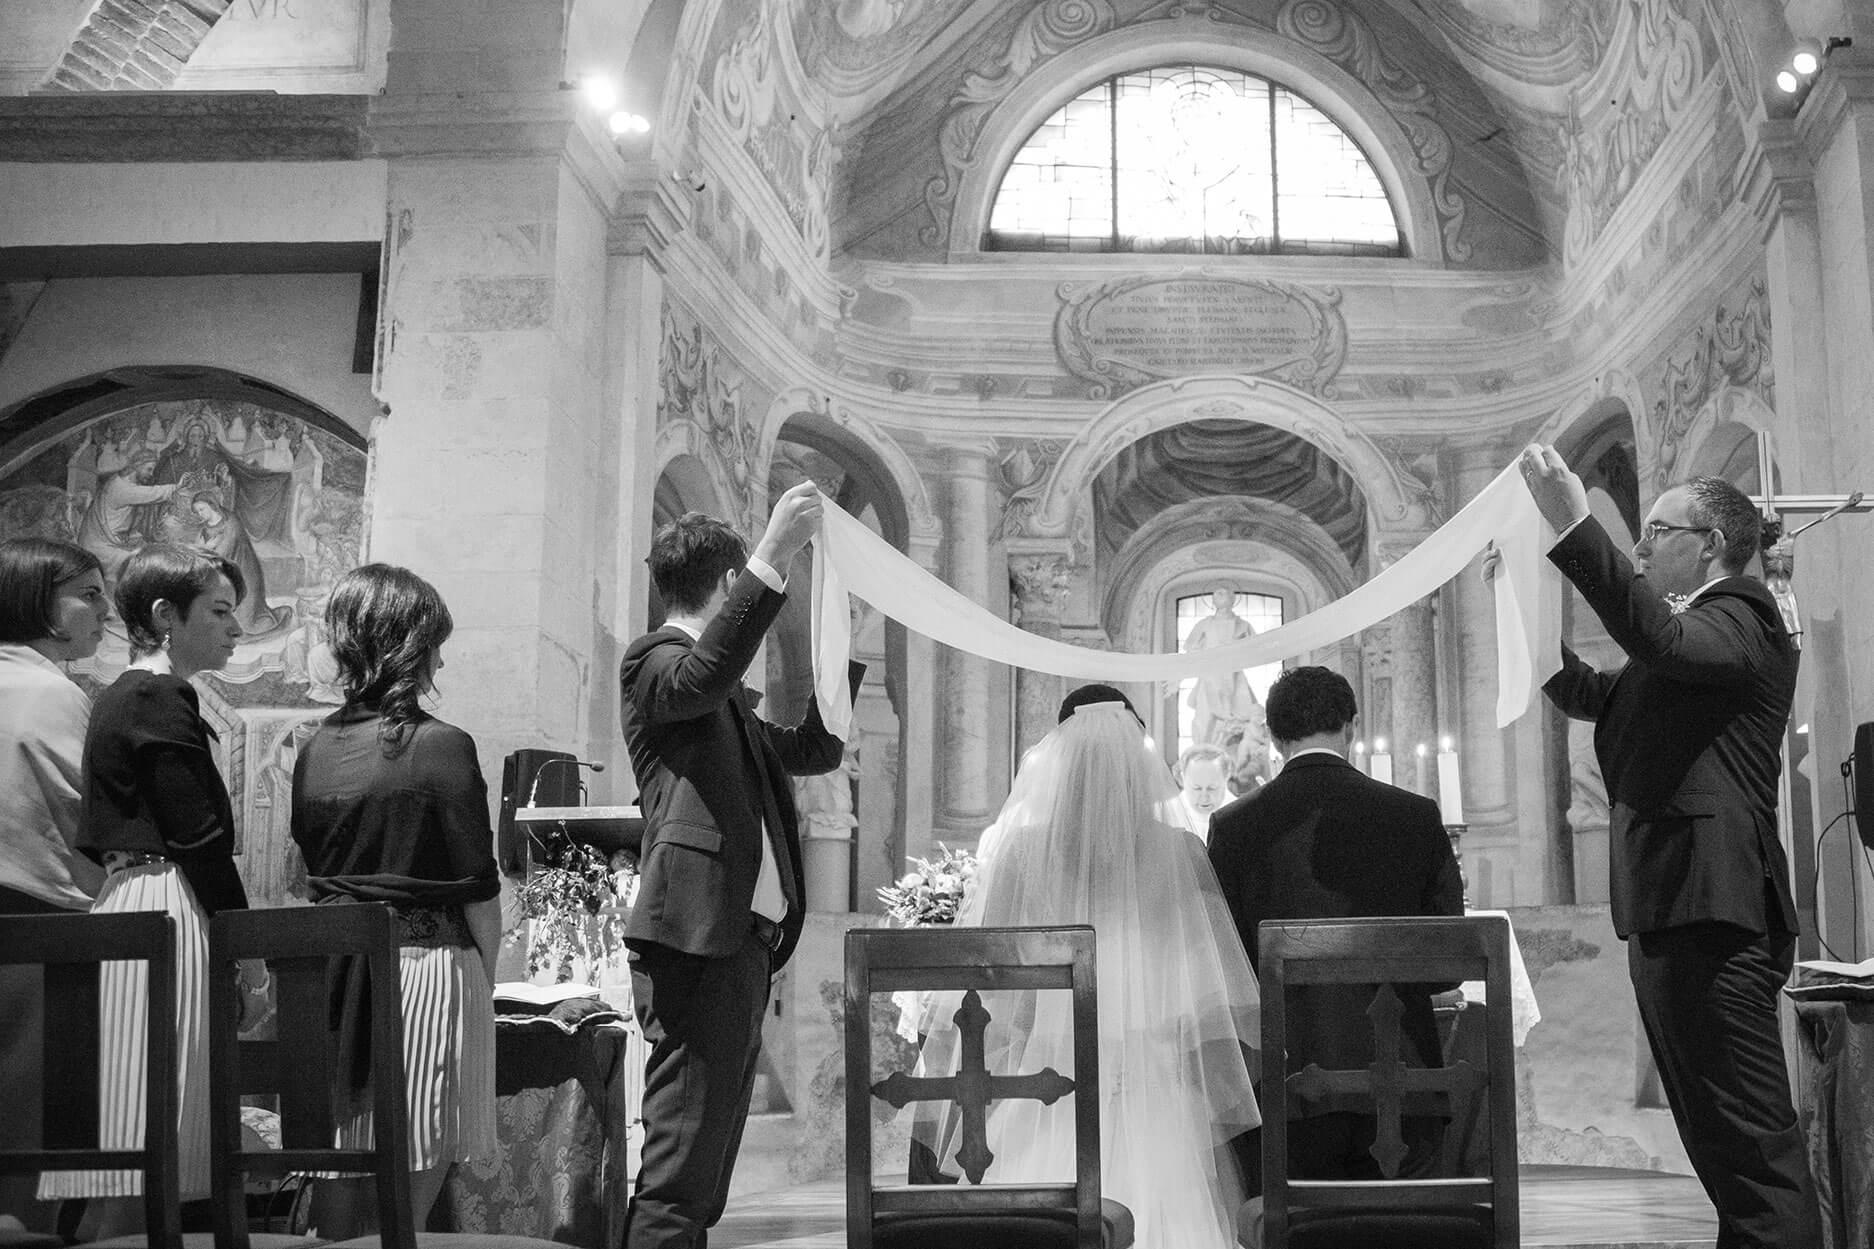 Francesca-Ferrati-wedding-photographer-Verona-Elena-Tommaso12